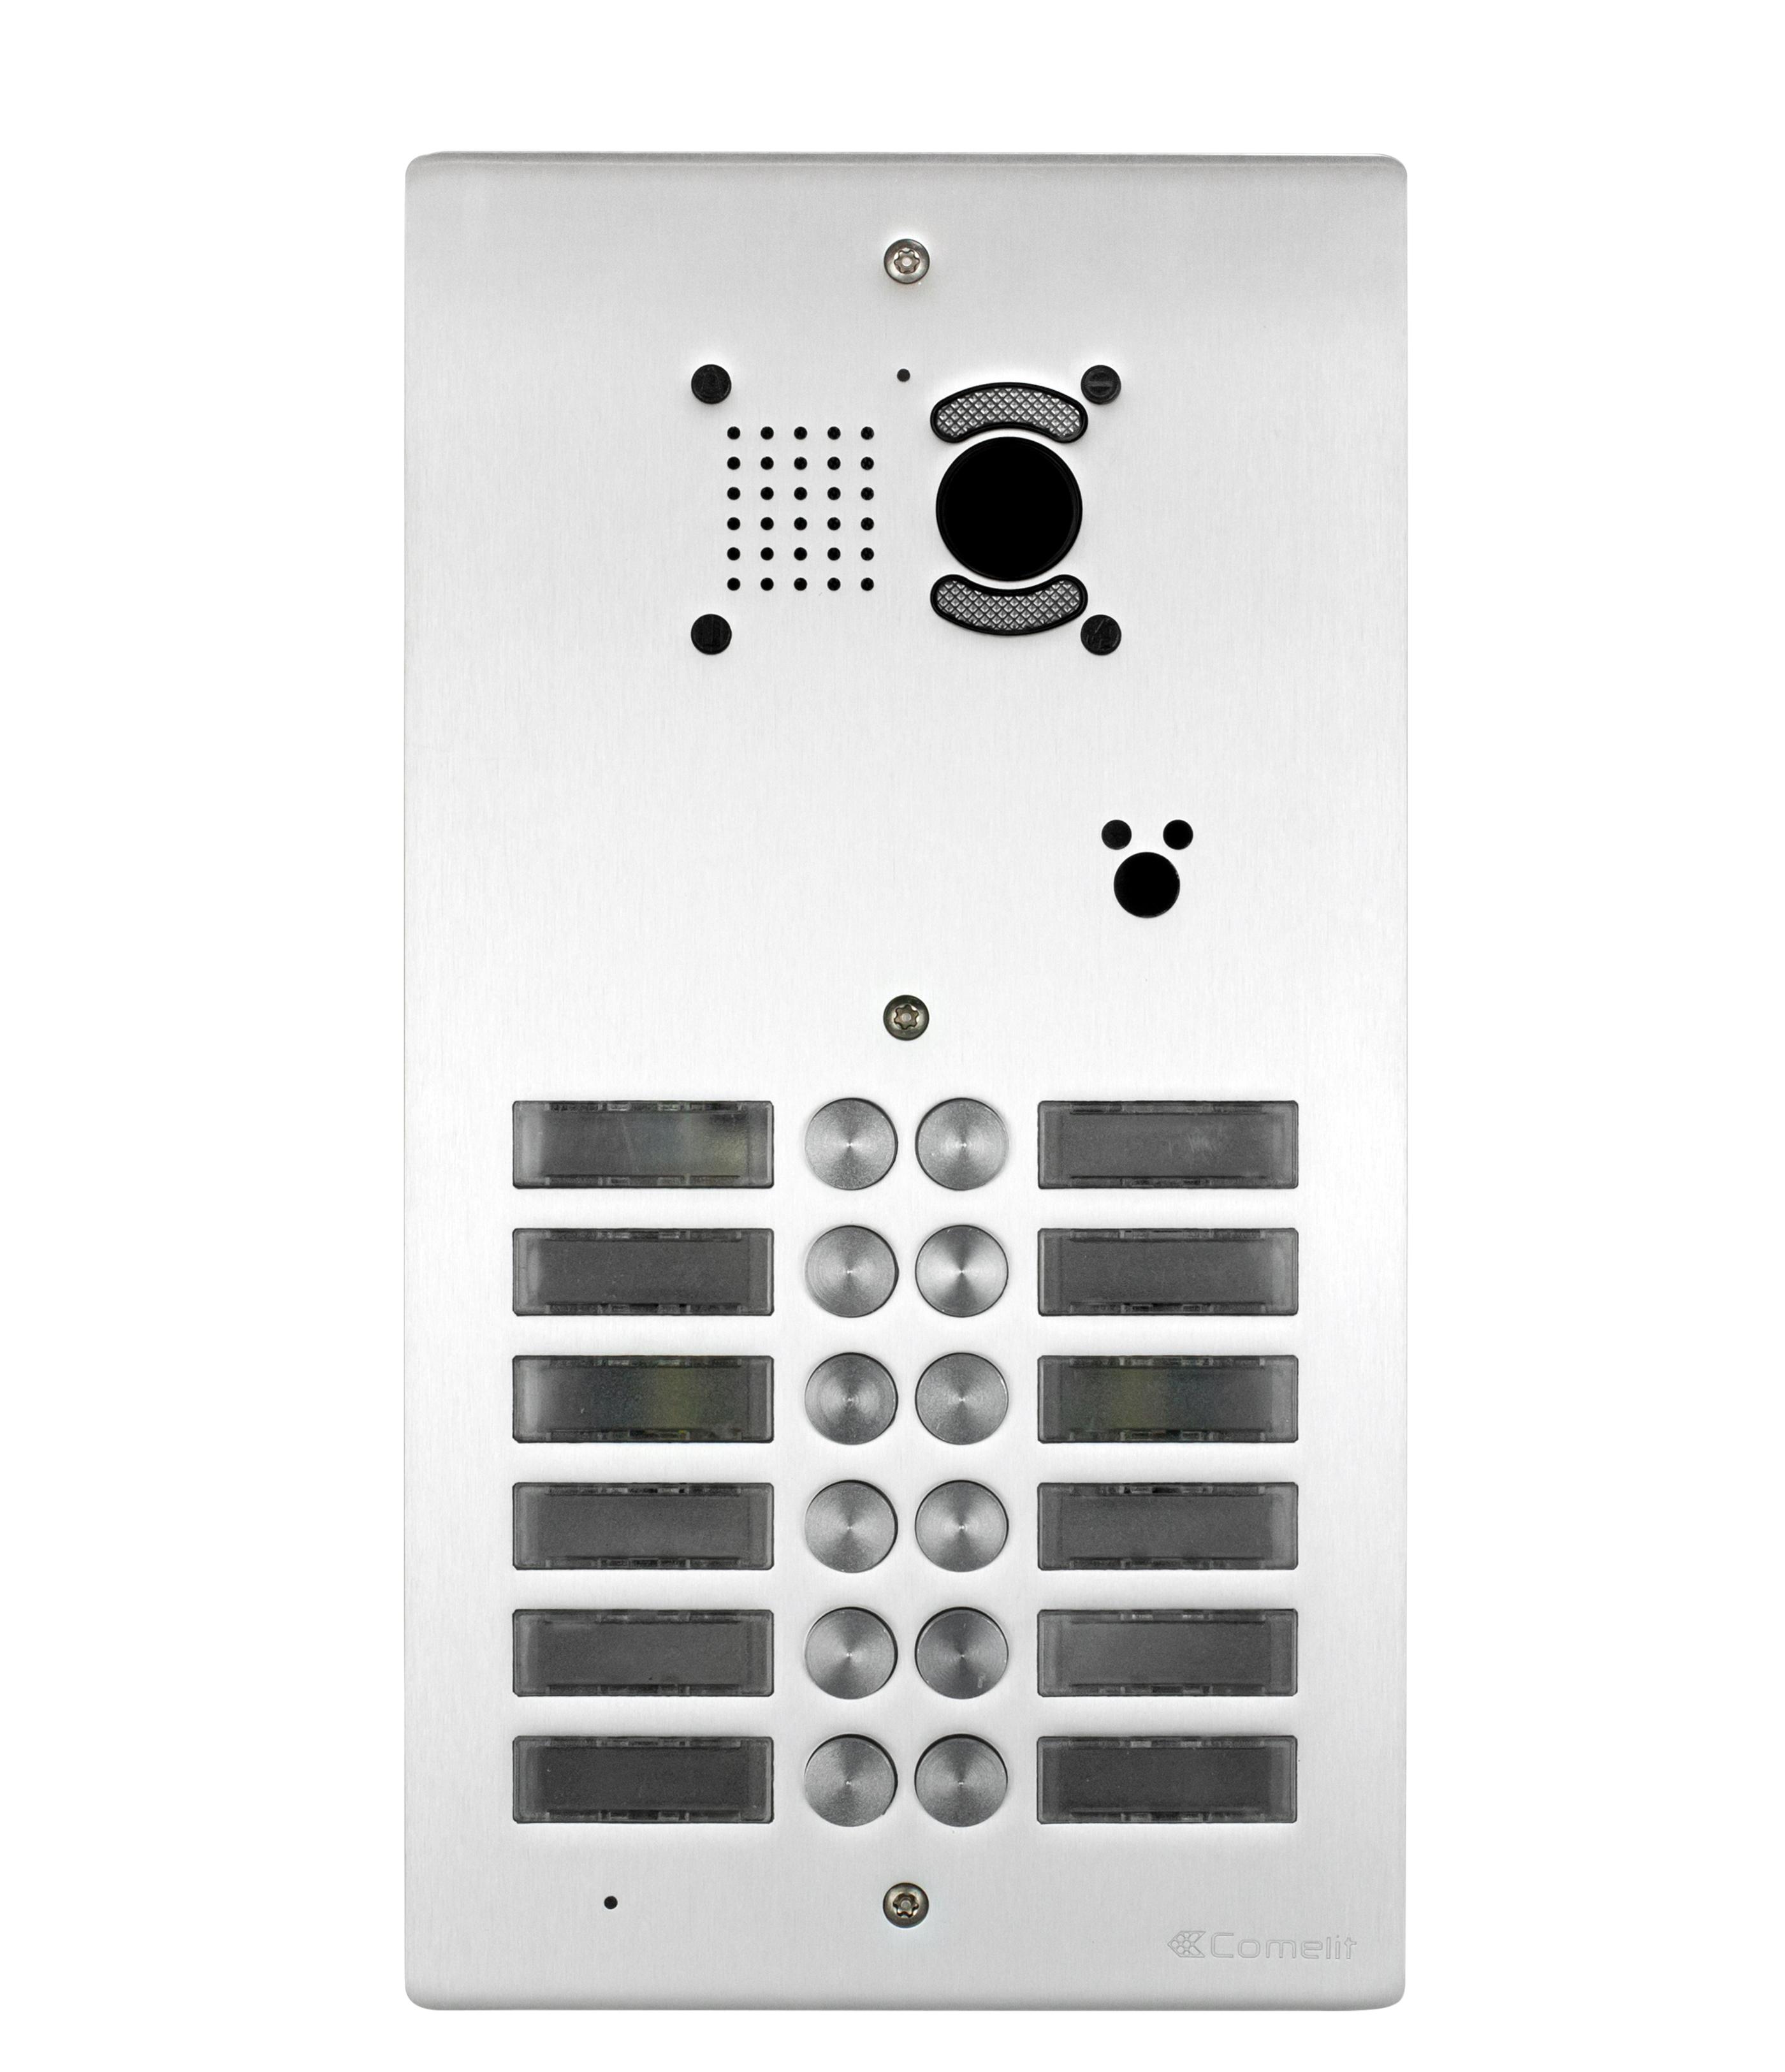 1 Stk AV-Panel Video, 14 Tasten mit Postschloss-Ausschnitt, Alu SP3014NVPT